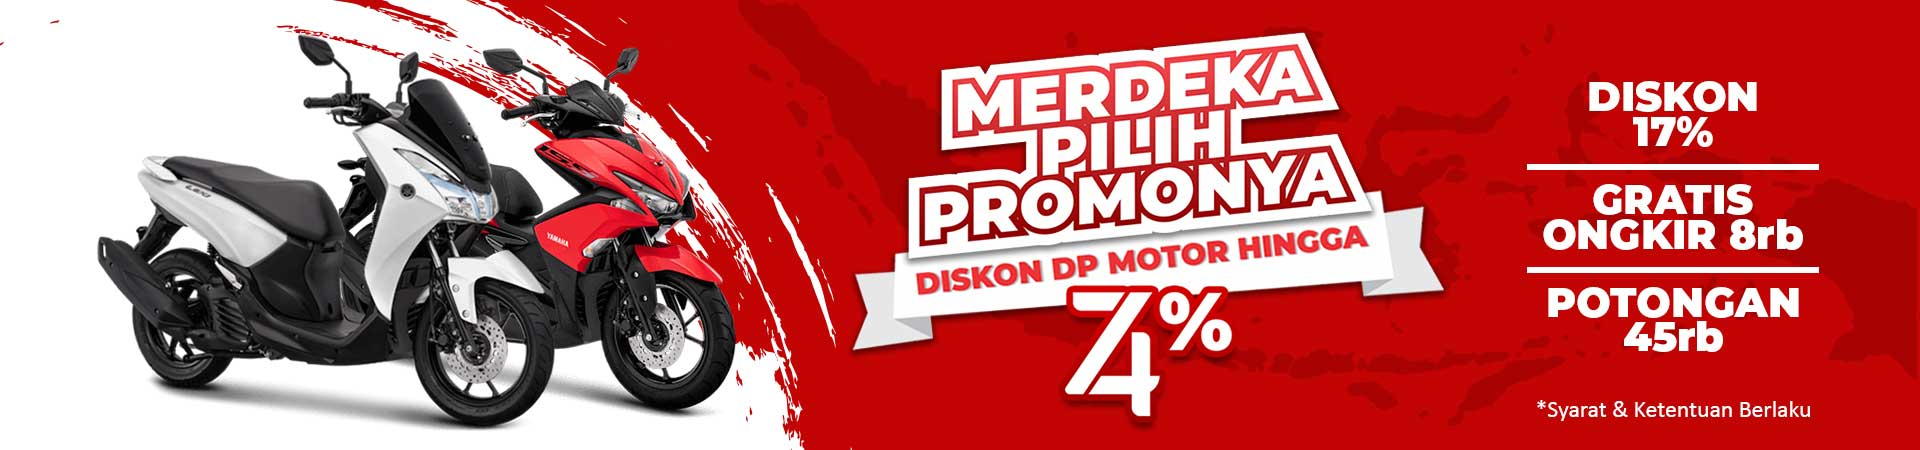 https://moladin.com/promo/all/merdeka-pilih-promonya-diskon-dp-motor-hingga-74